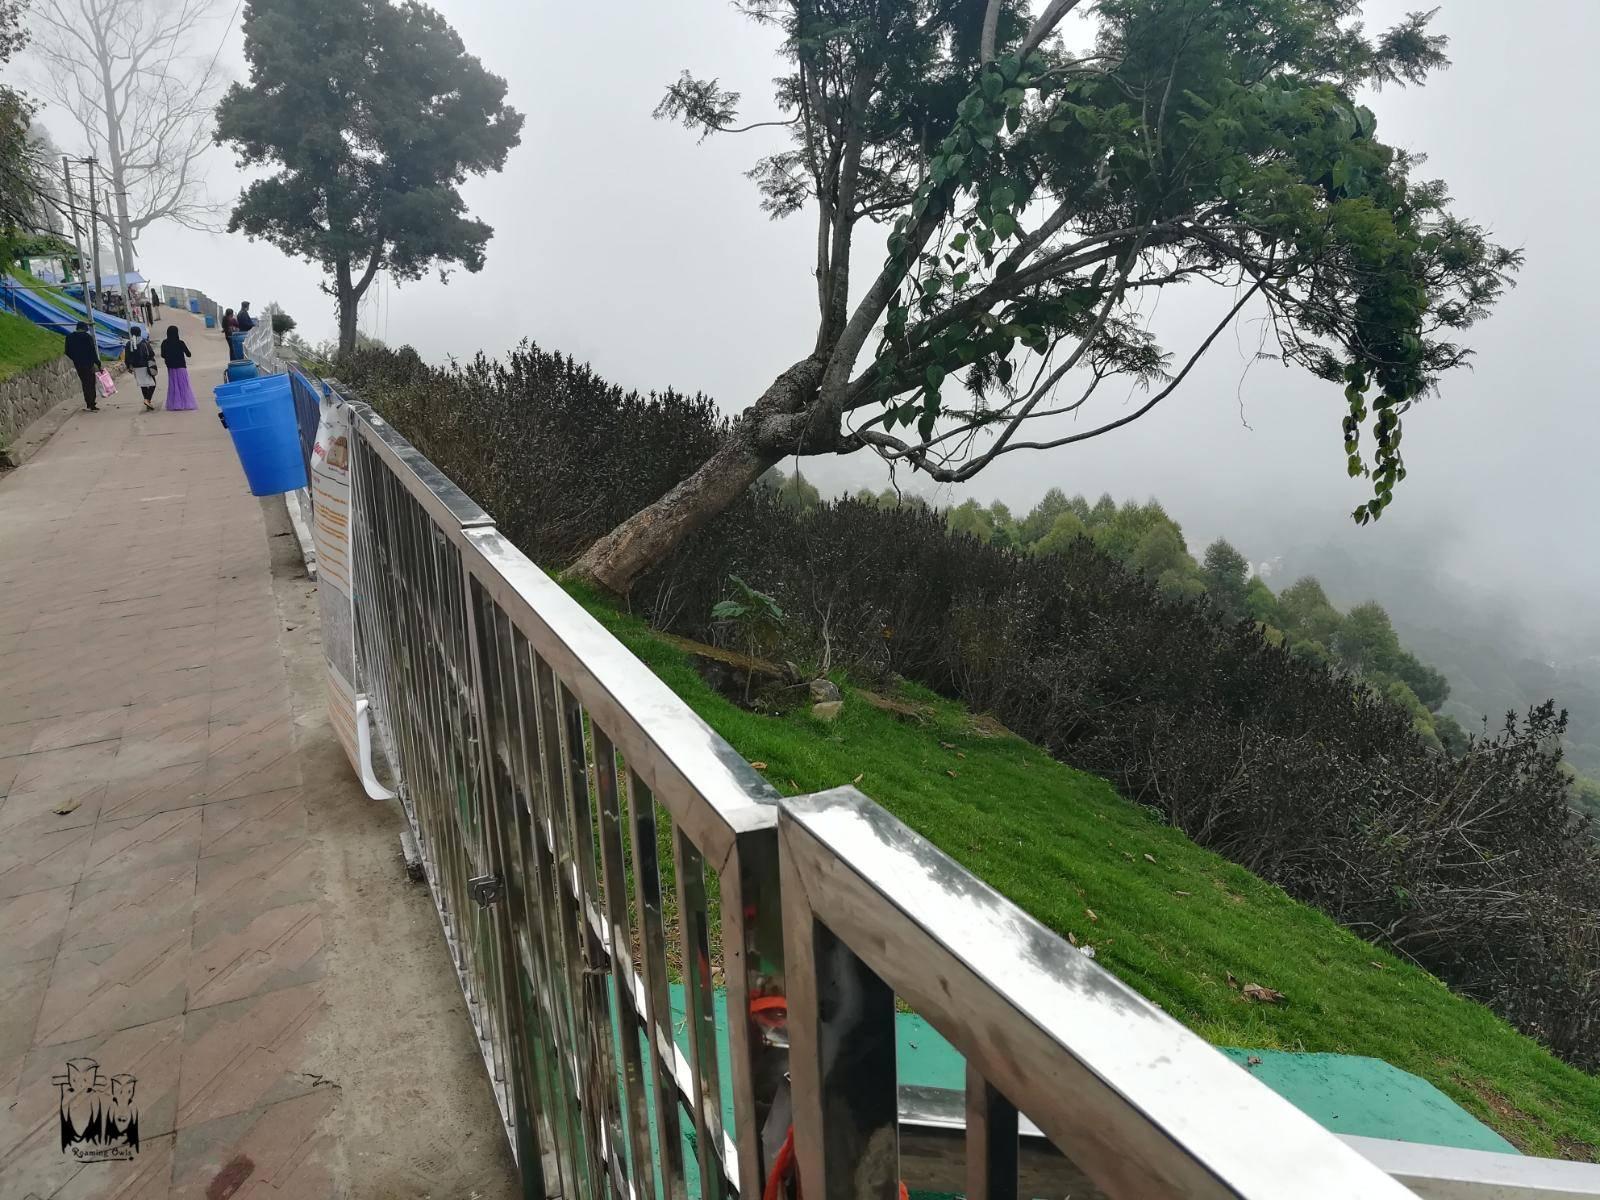 Coakers Walk,Kodaikanal tourist places, Kodaikanal Kurinji location